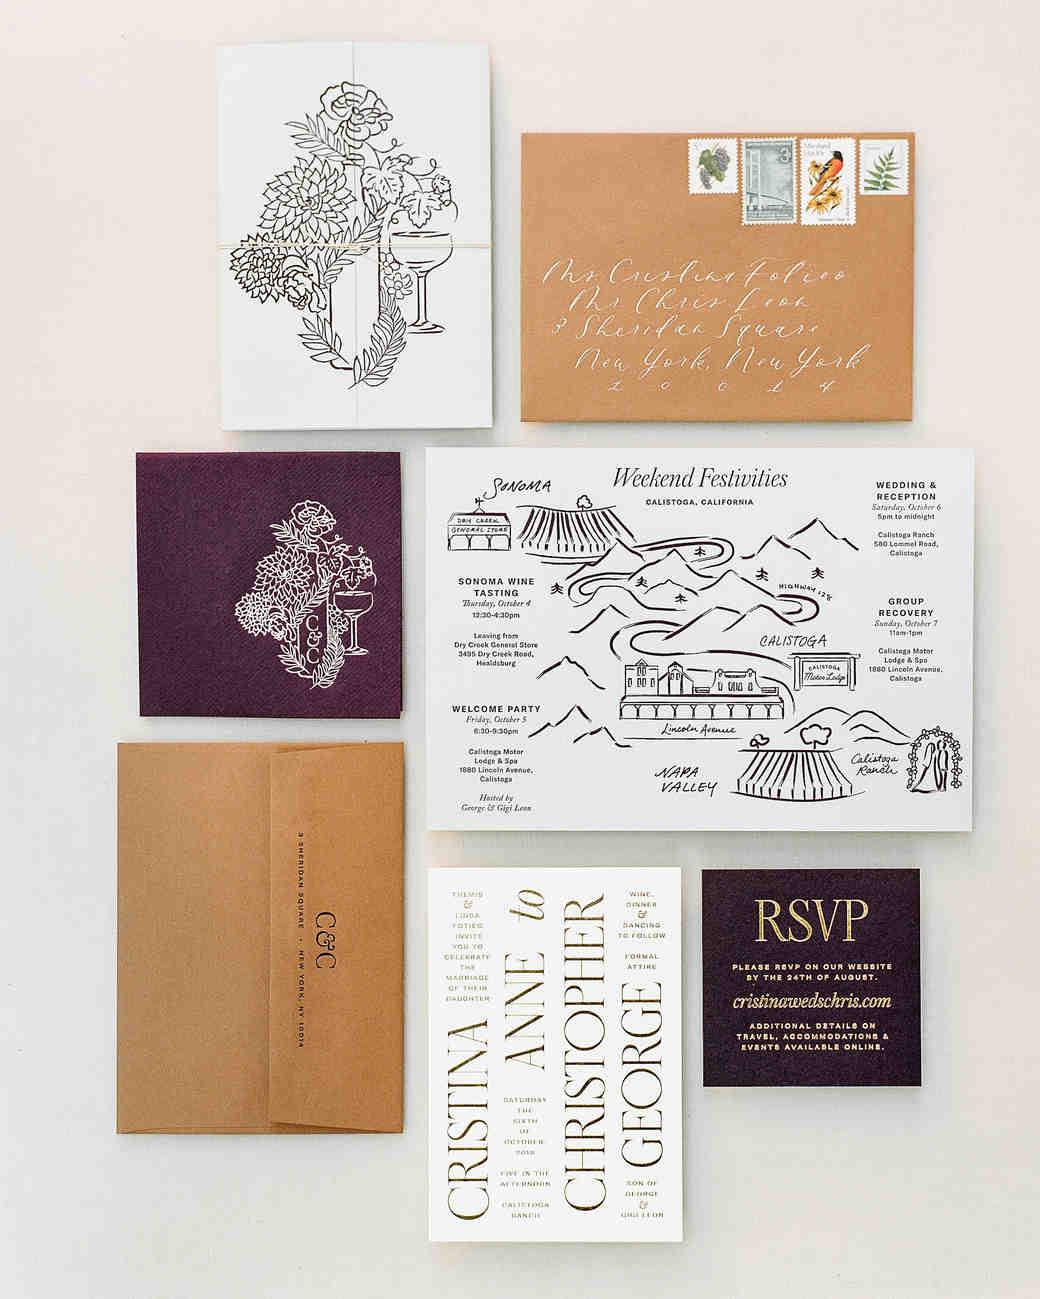 cristina chris wedding stationery suite